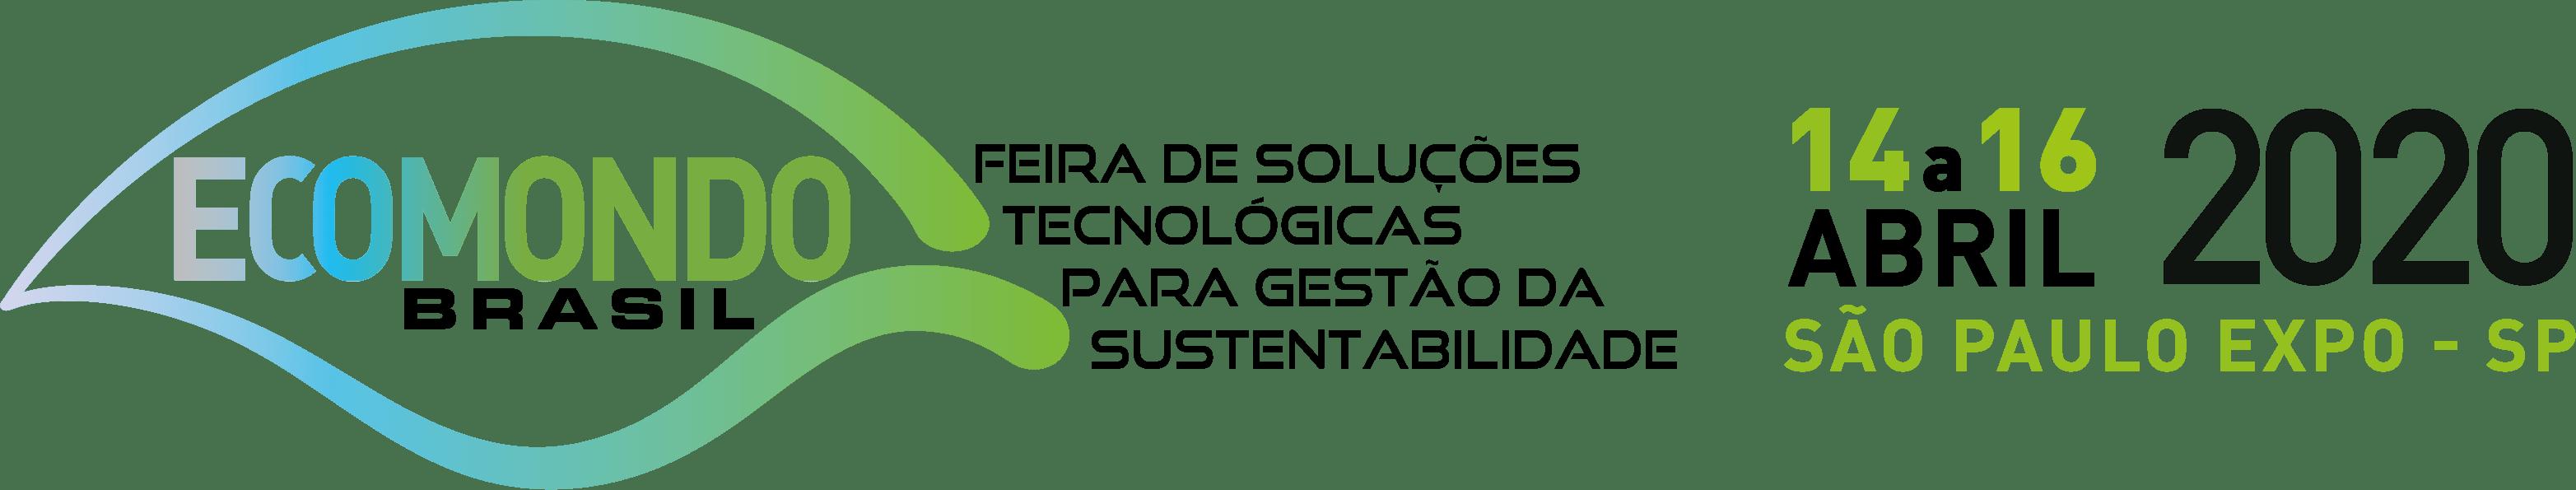 Feira de Meio Ambiente Industrial e Sustentabilidade